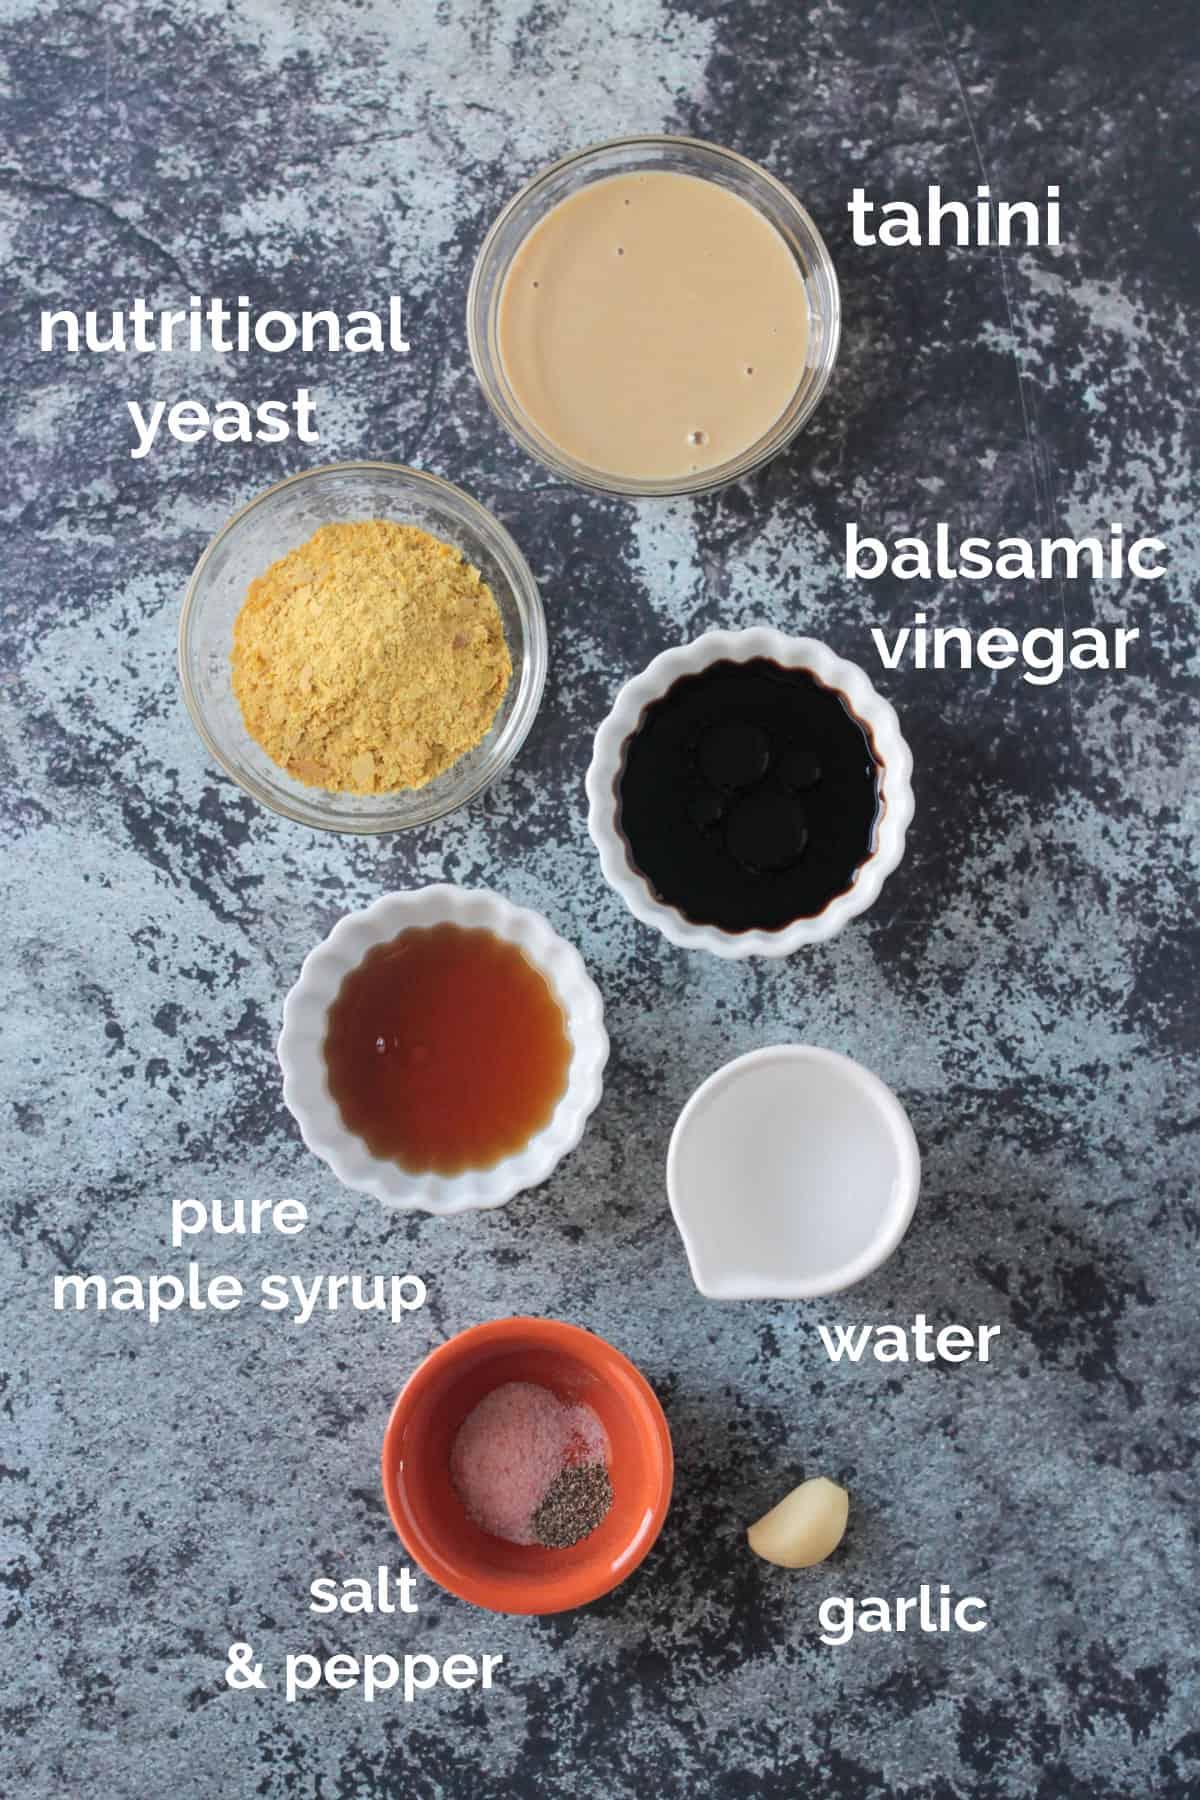 Tahini dressing recipe ingredients arrayed in individual bowls.